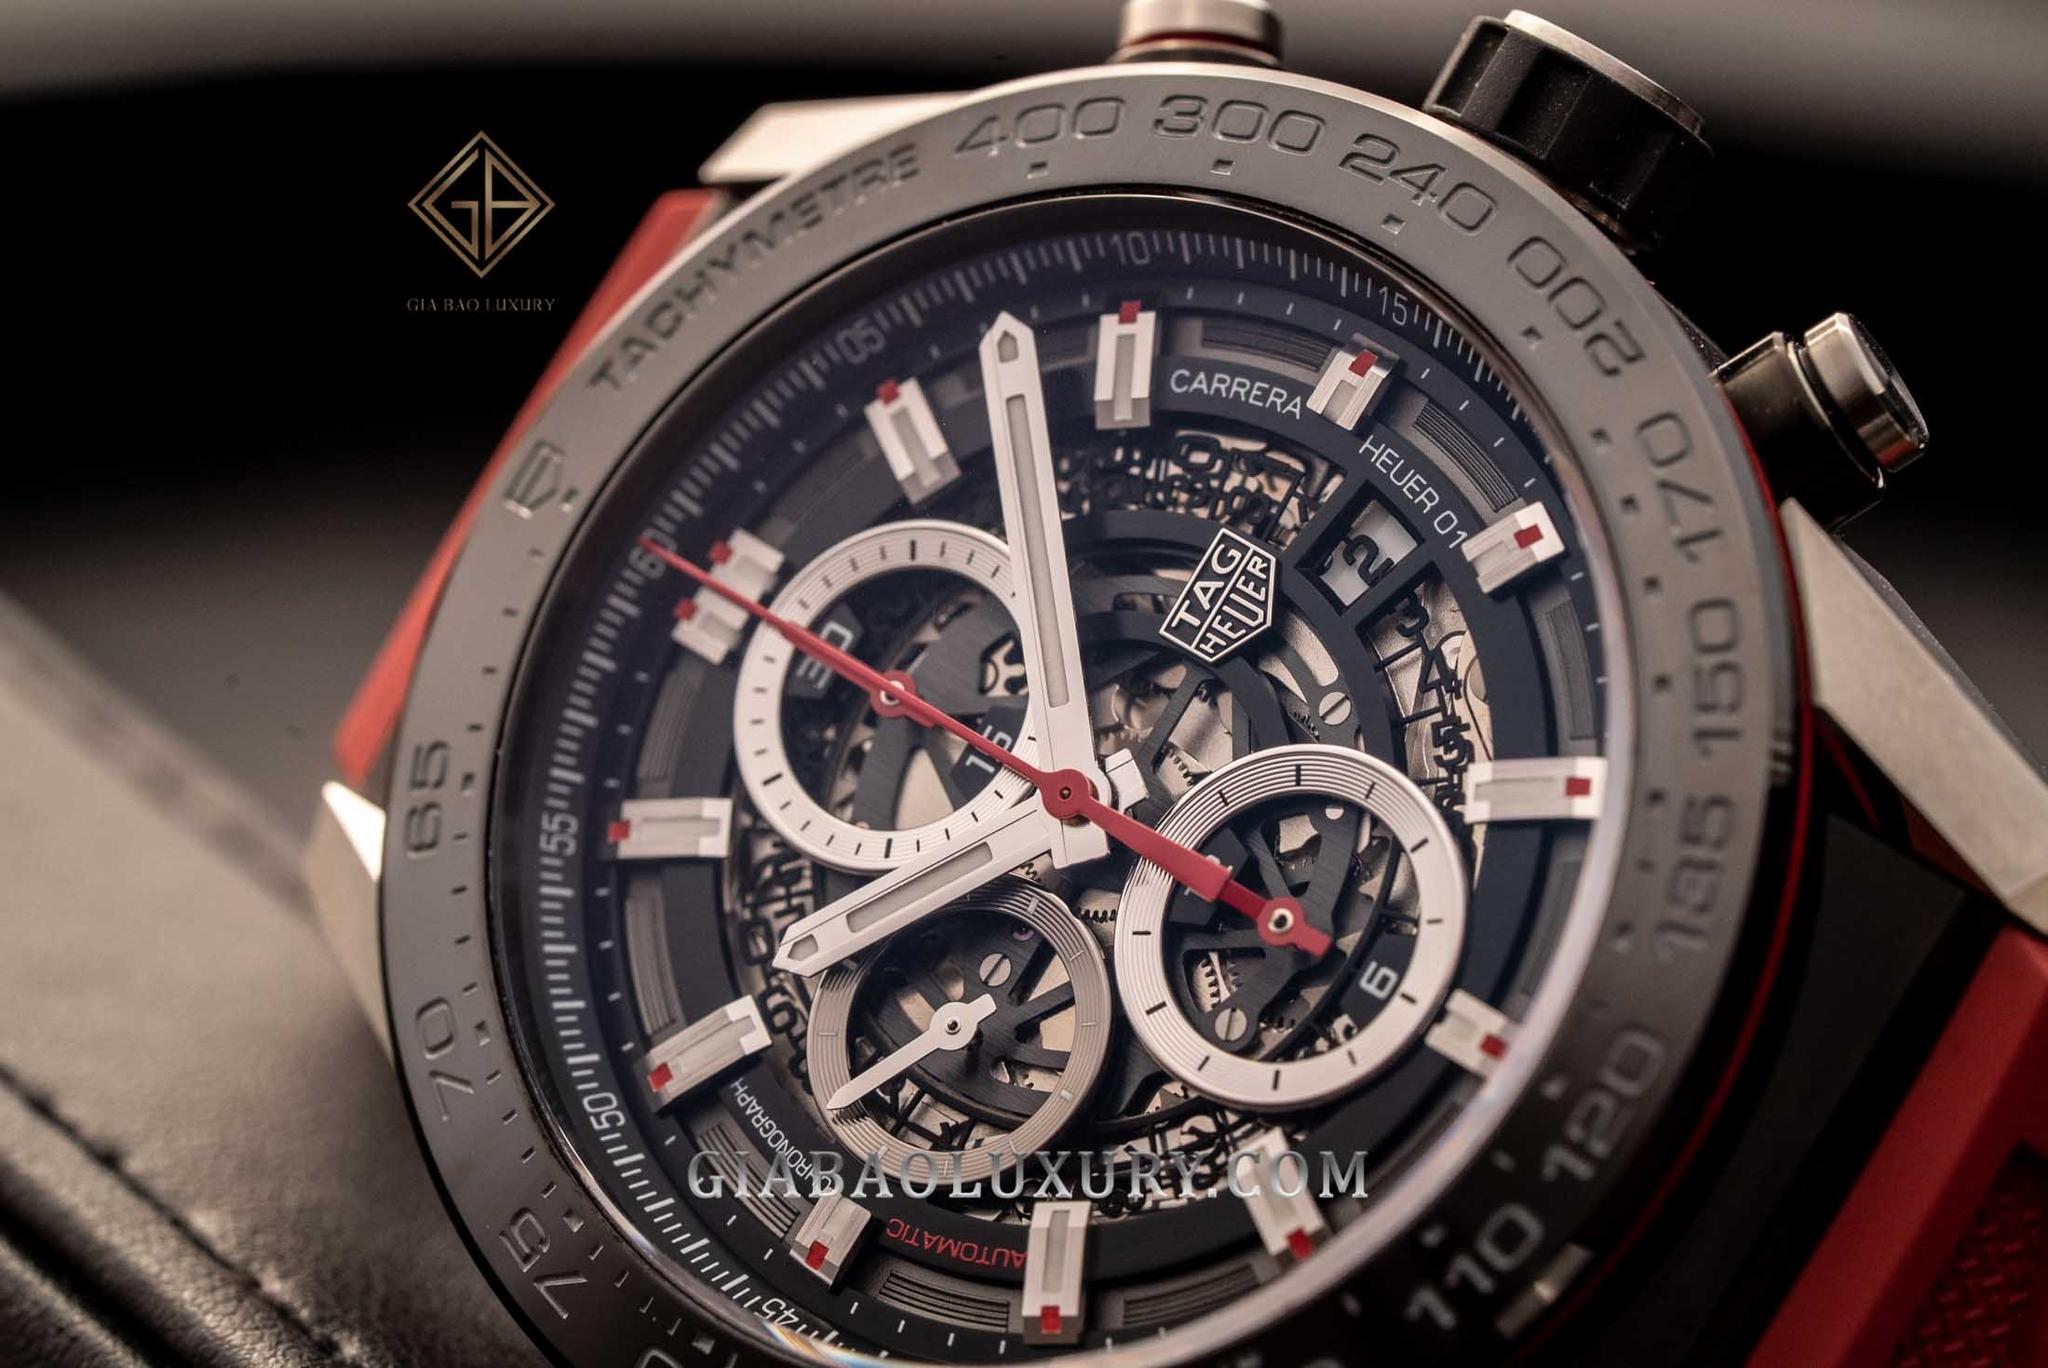 Đồng hồ TAG Heuer Carrera Calibre Heuer 01